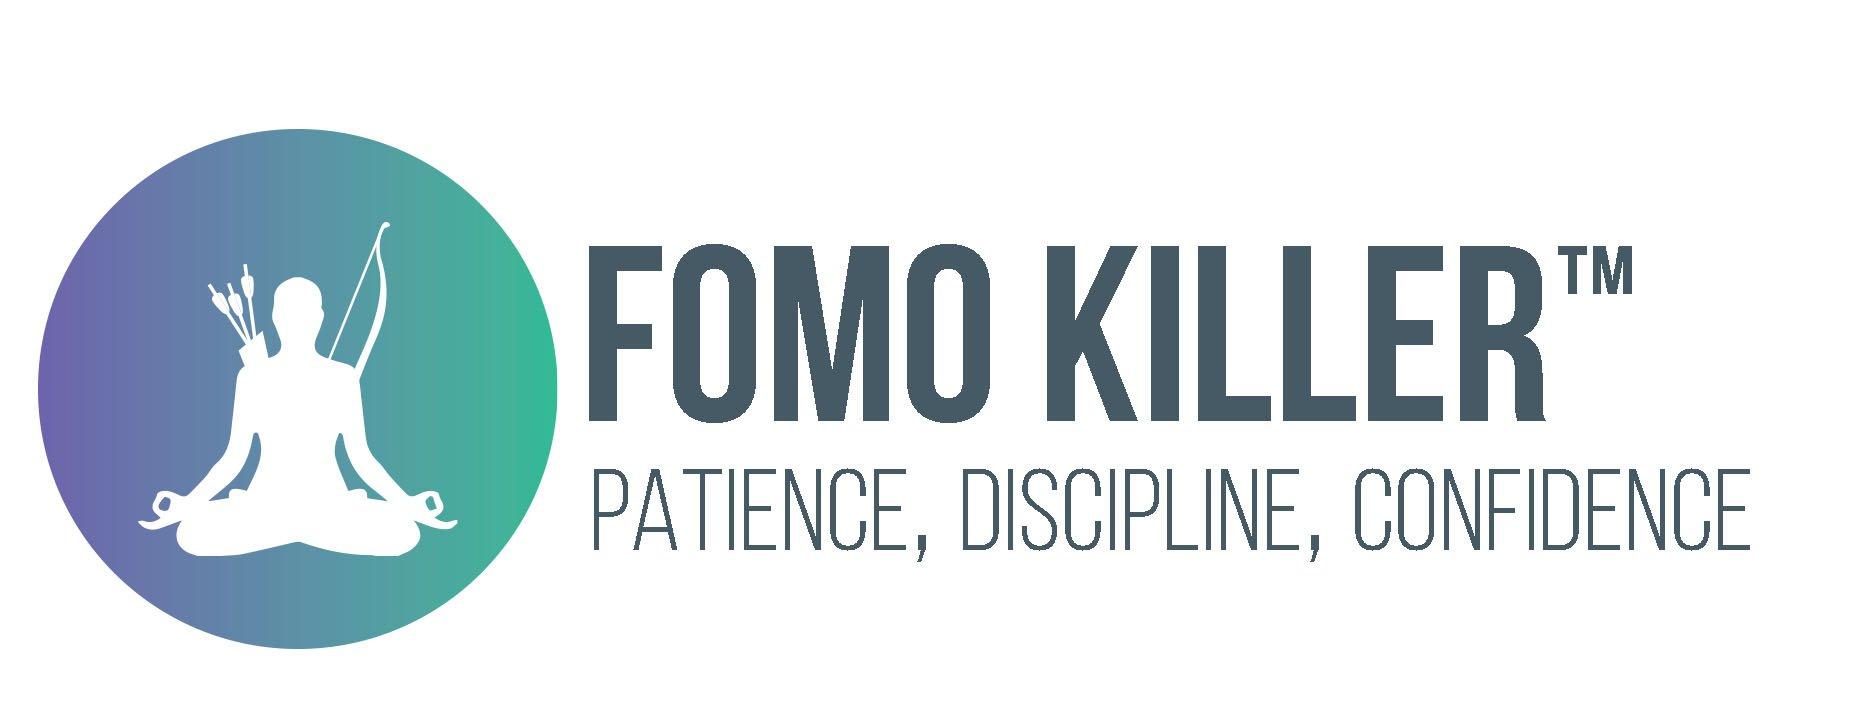 funded-trader FOMO Killer with slogan 2021